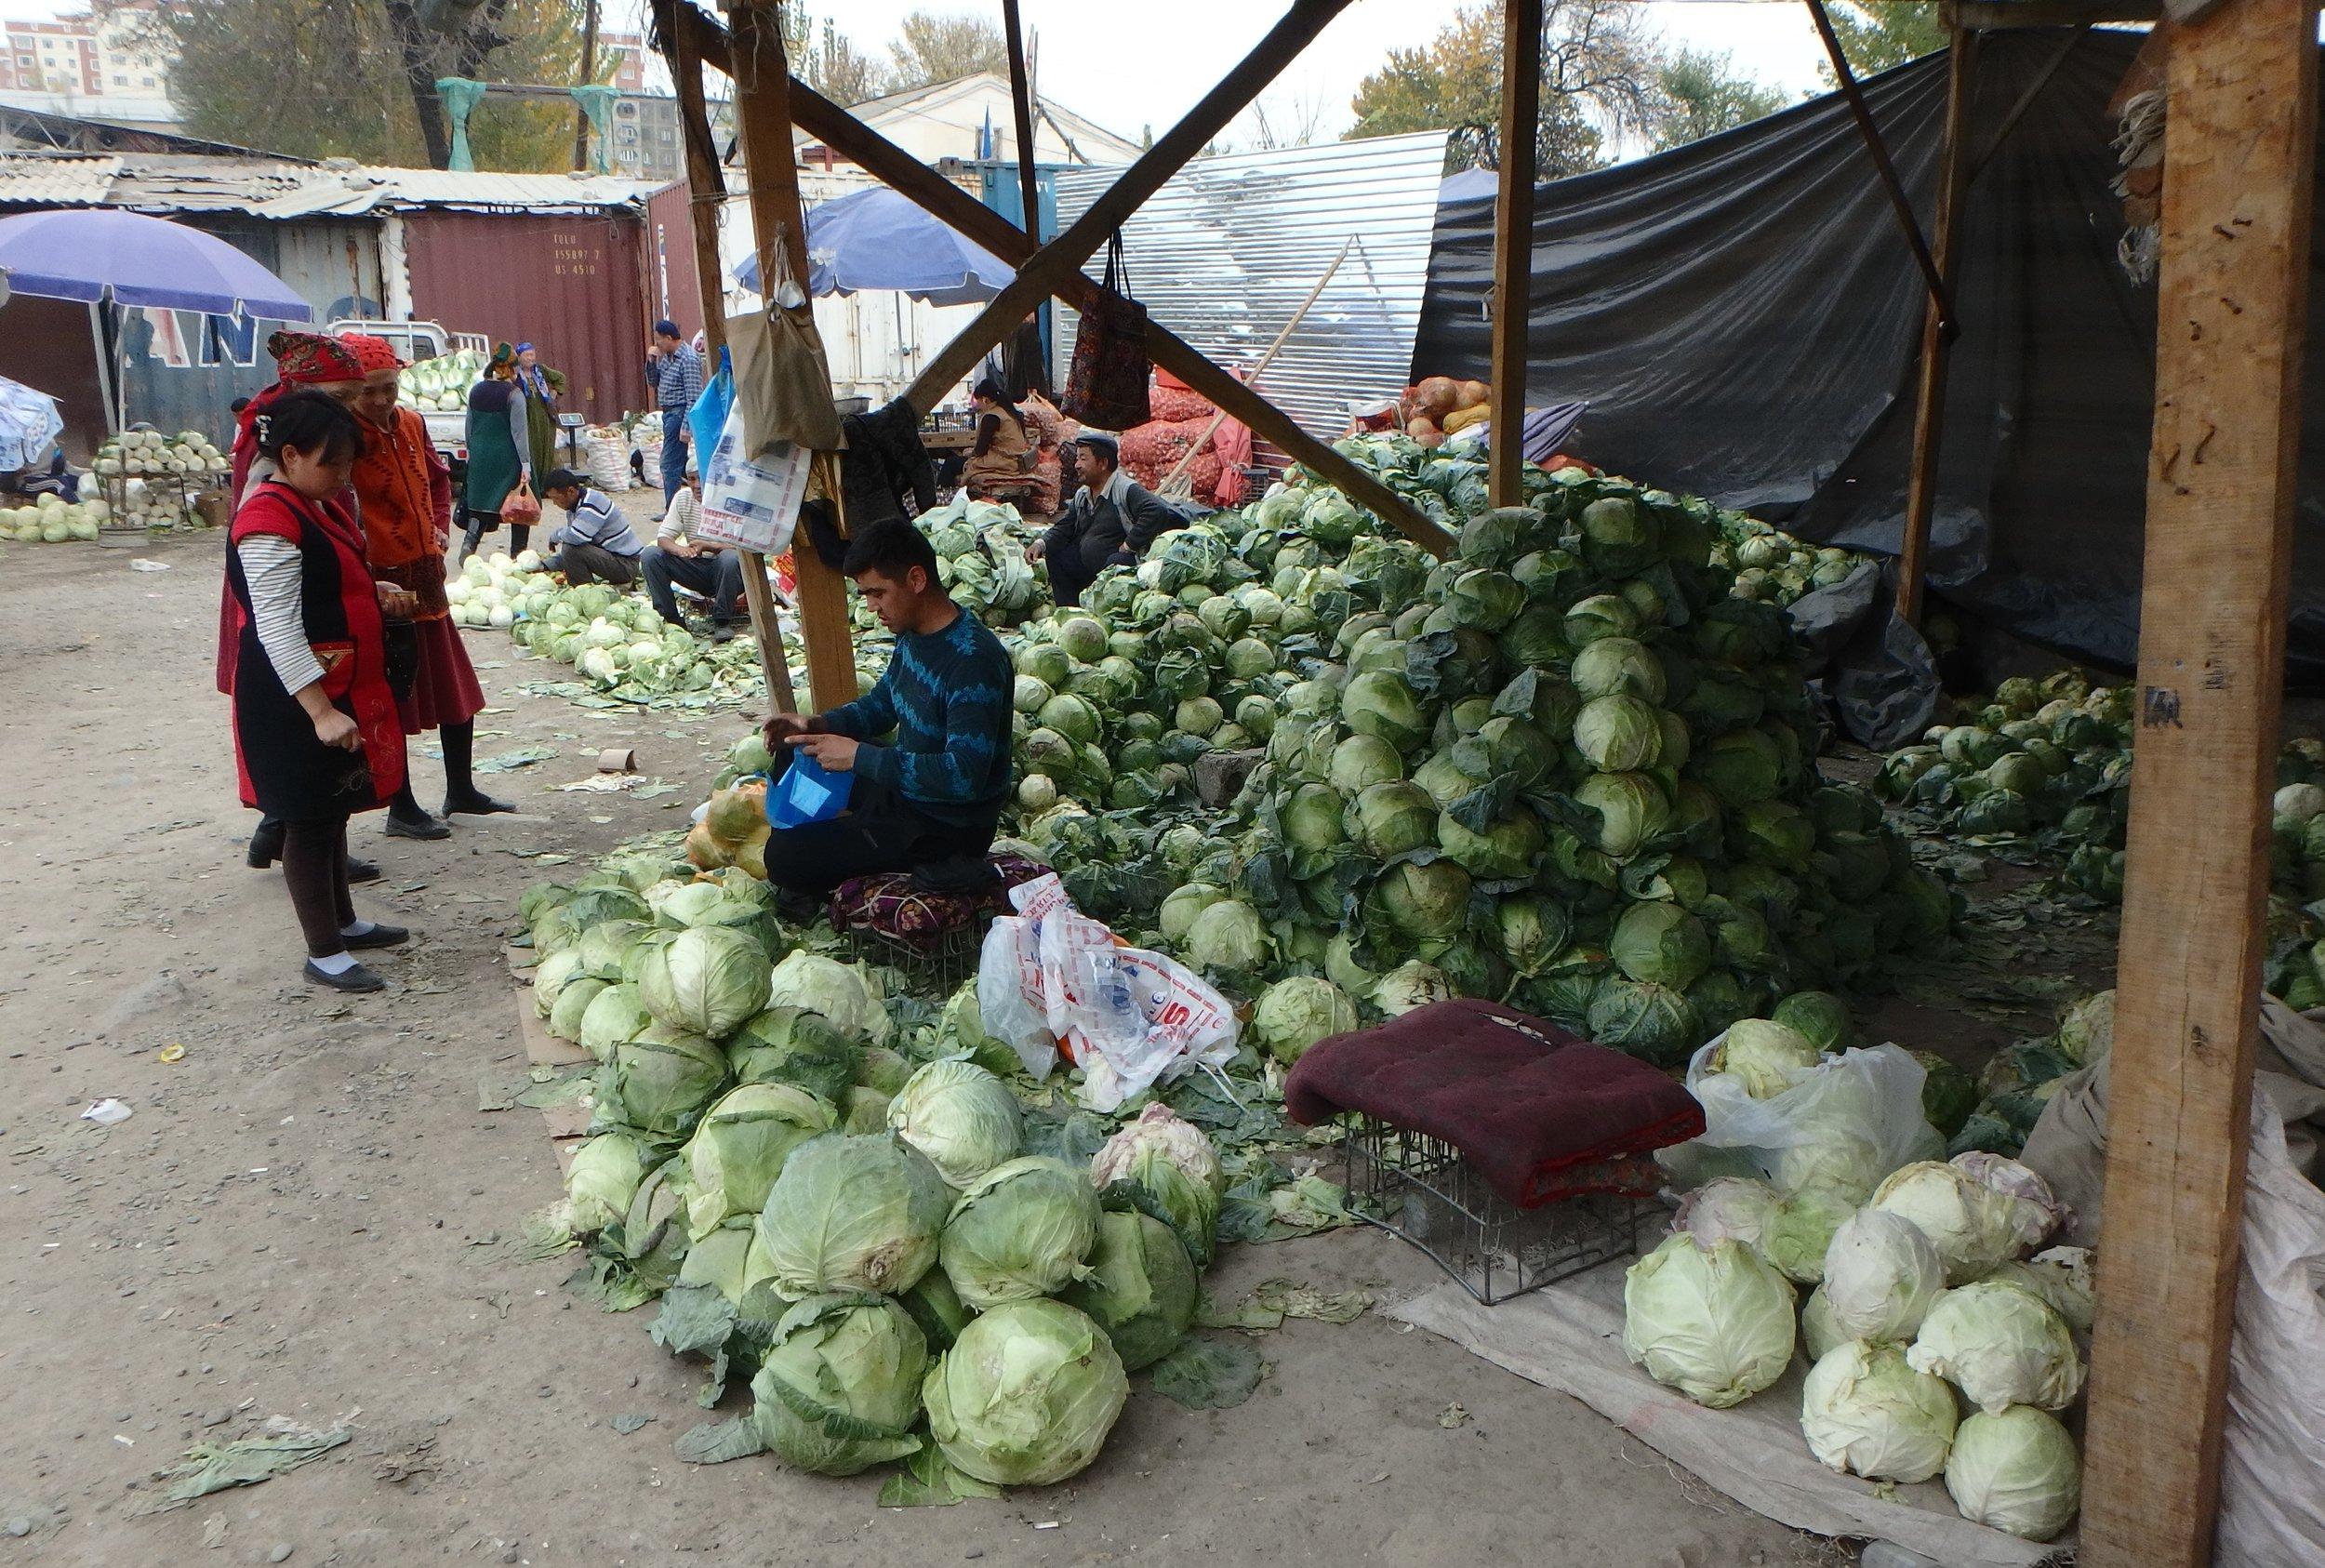 One for the vegetarians, Osh bazaar.